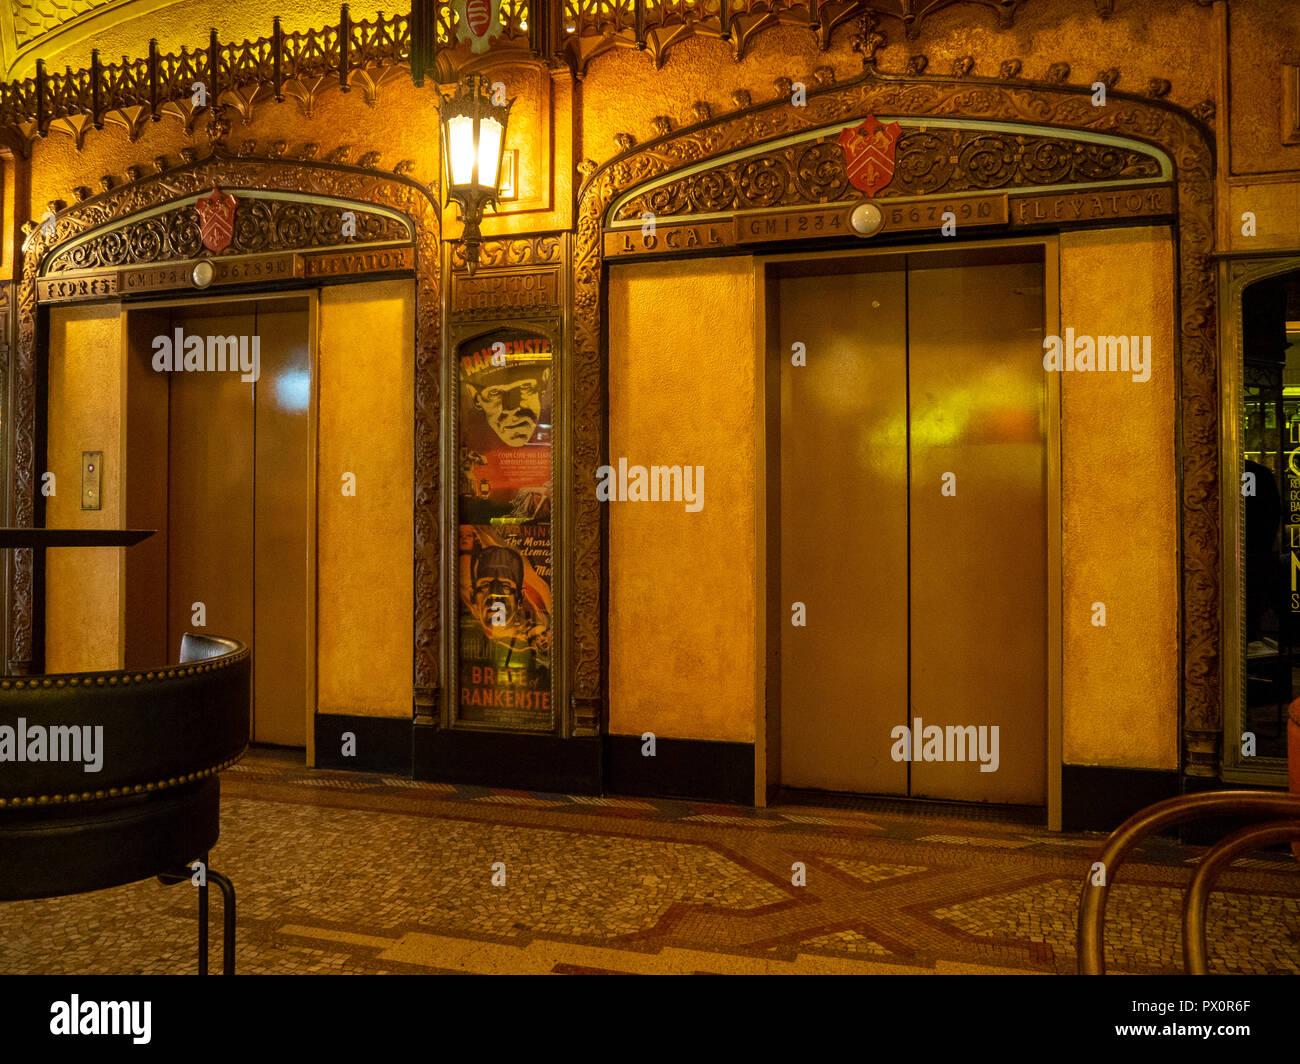 Art Deco ornate elevators in the lobby of the QT Hotel Market Street Sydney NSW Australia. - Stock Image